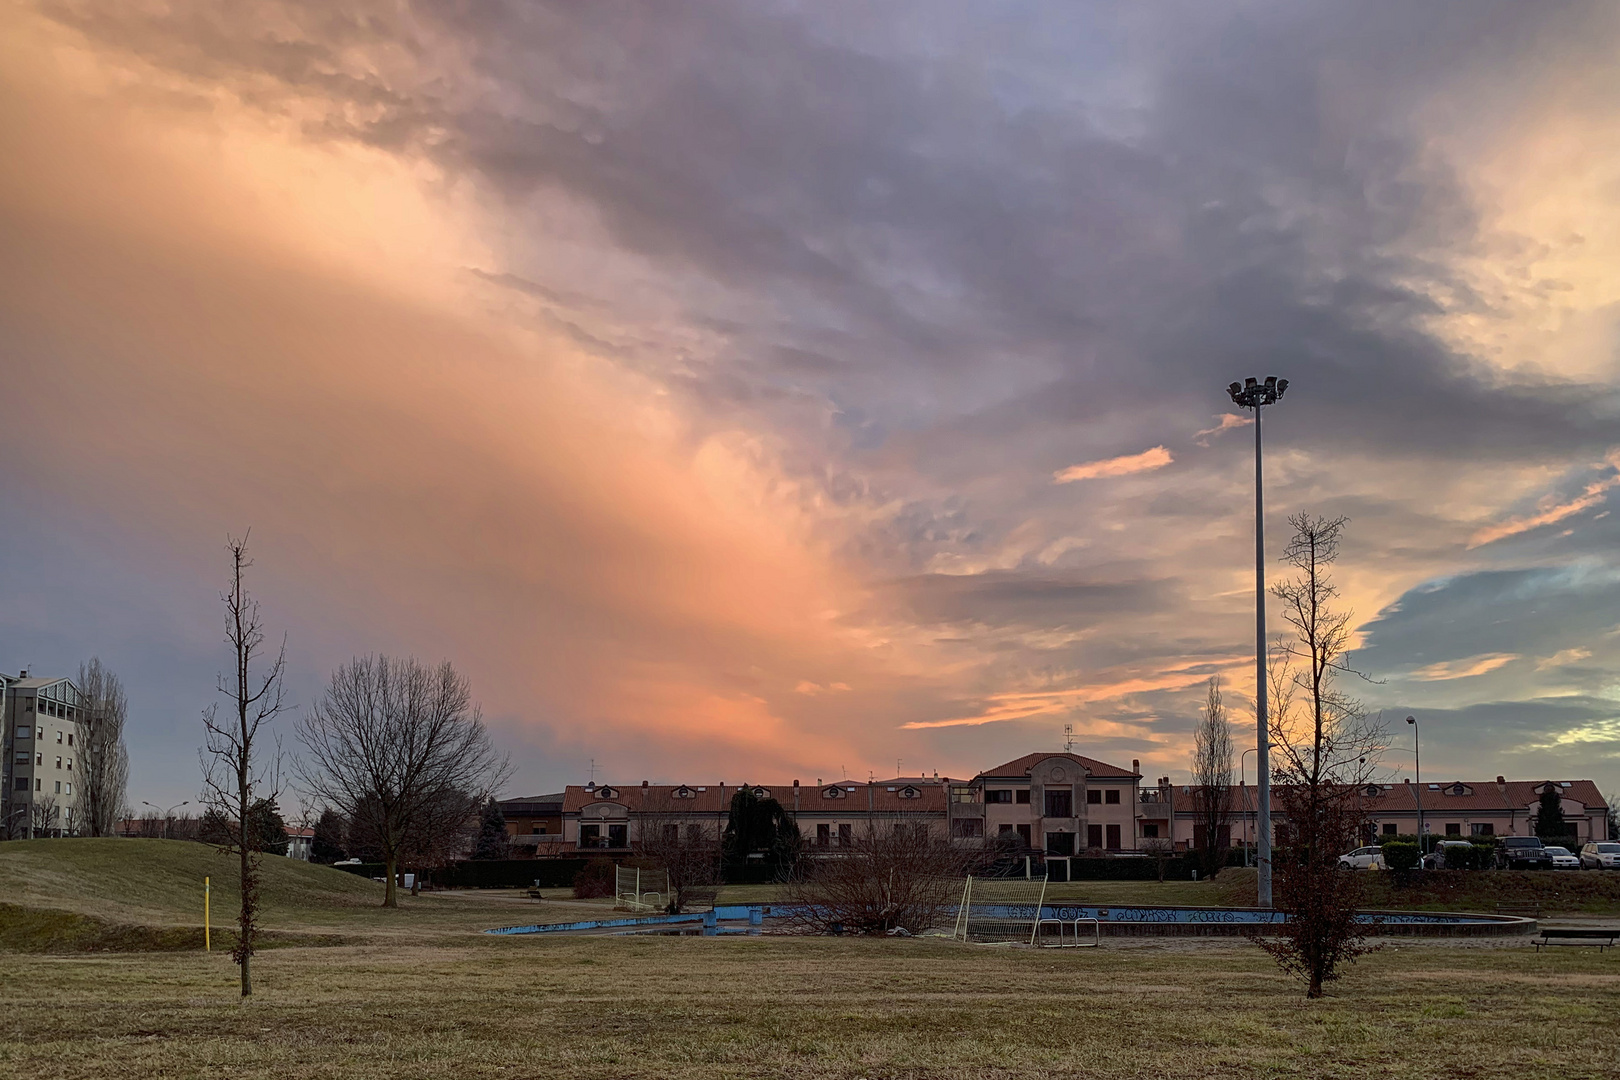 Nuvole rosse